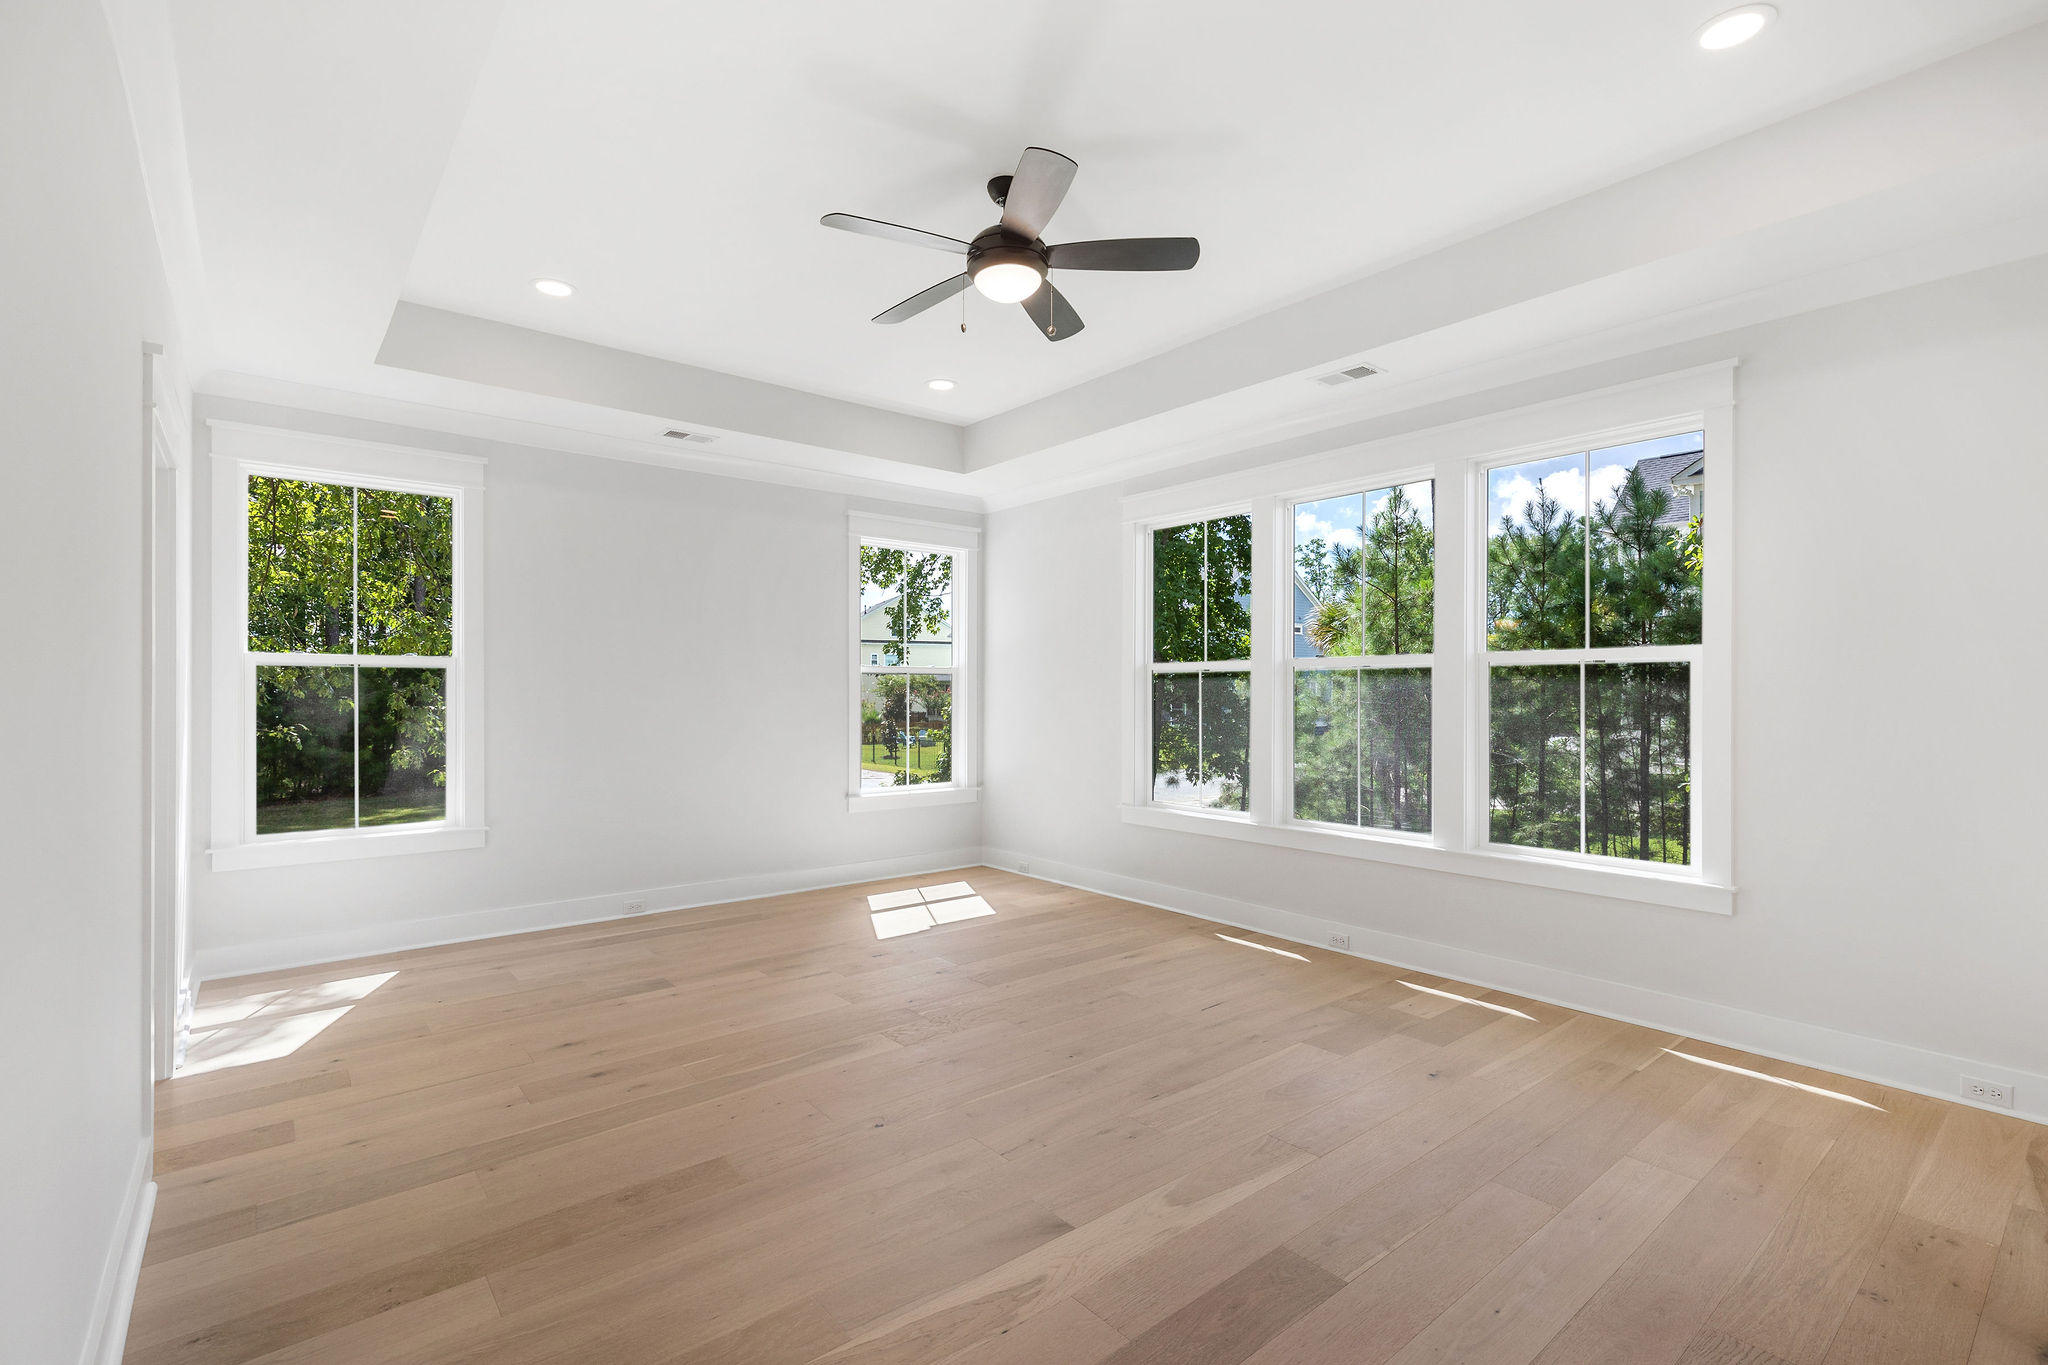 Park West Homes For Sale - 2291 Middlesex, Mount Pleasant, SC - 71